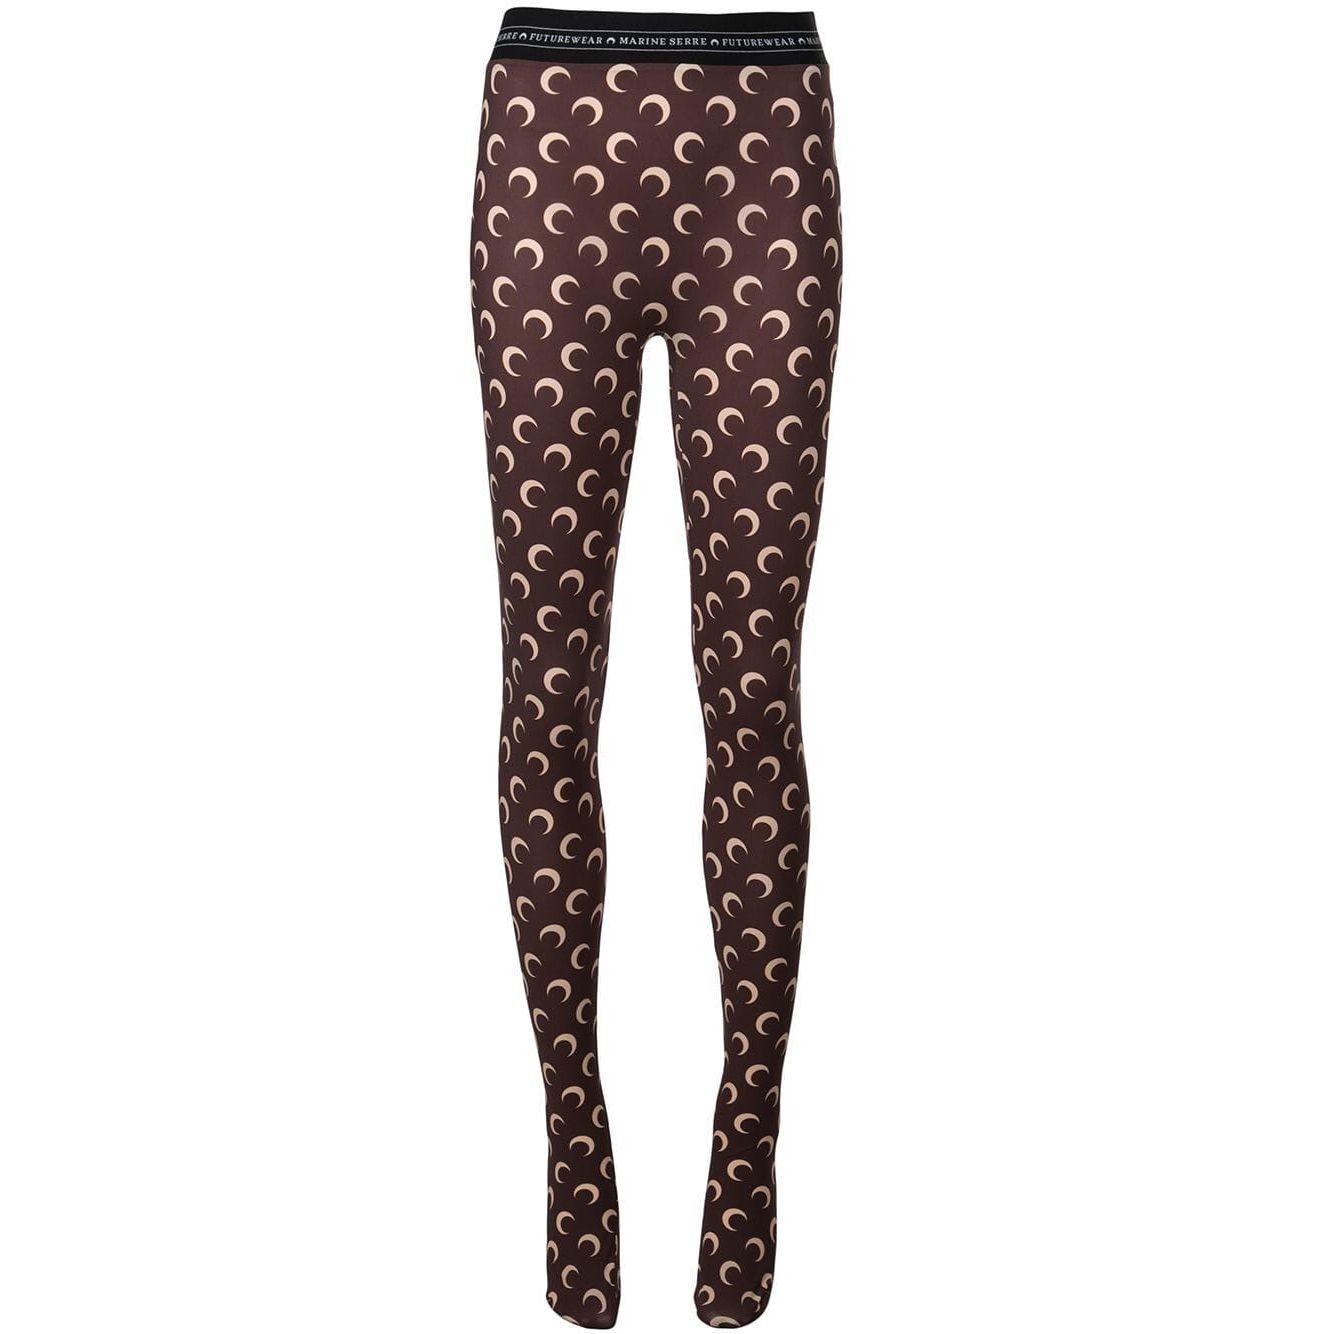 Nuovi pantaloni di Serre Marine Donne Leggings Moda Moda Luna stampata Leggings Skinny Color Design Design Pants Basic Calza